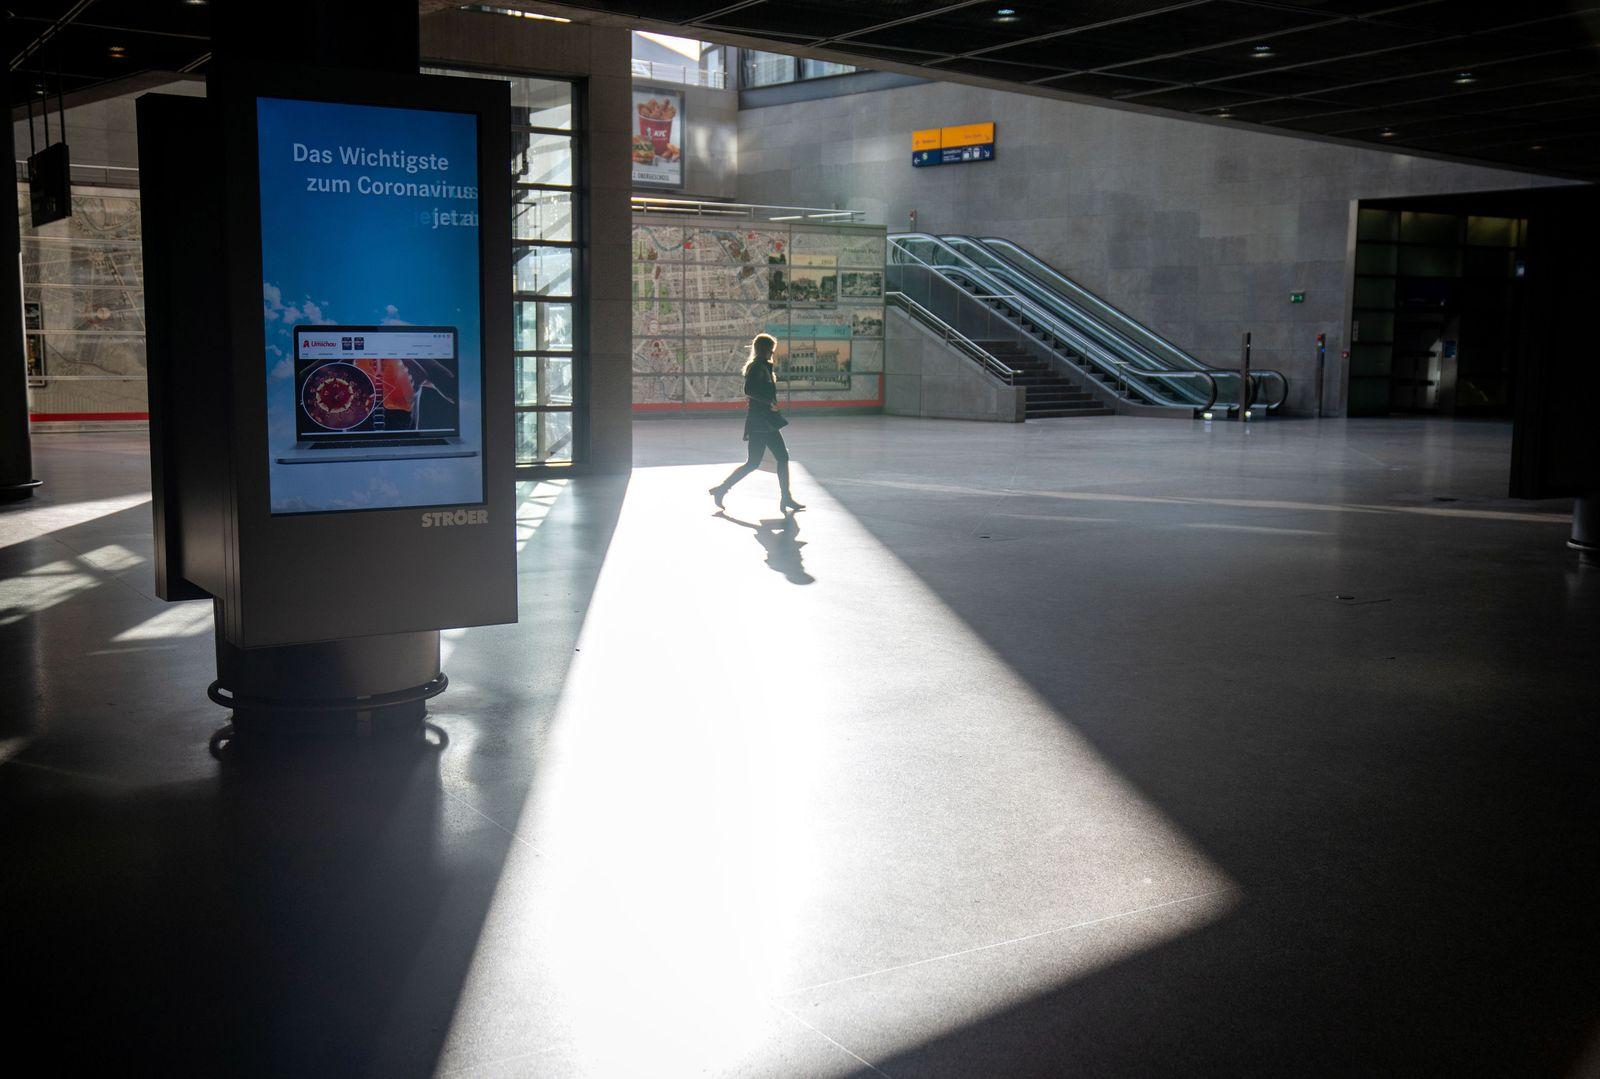 Coronavirus - leerer Bahnhof am Potsdamer Platz